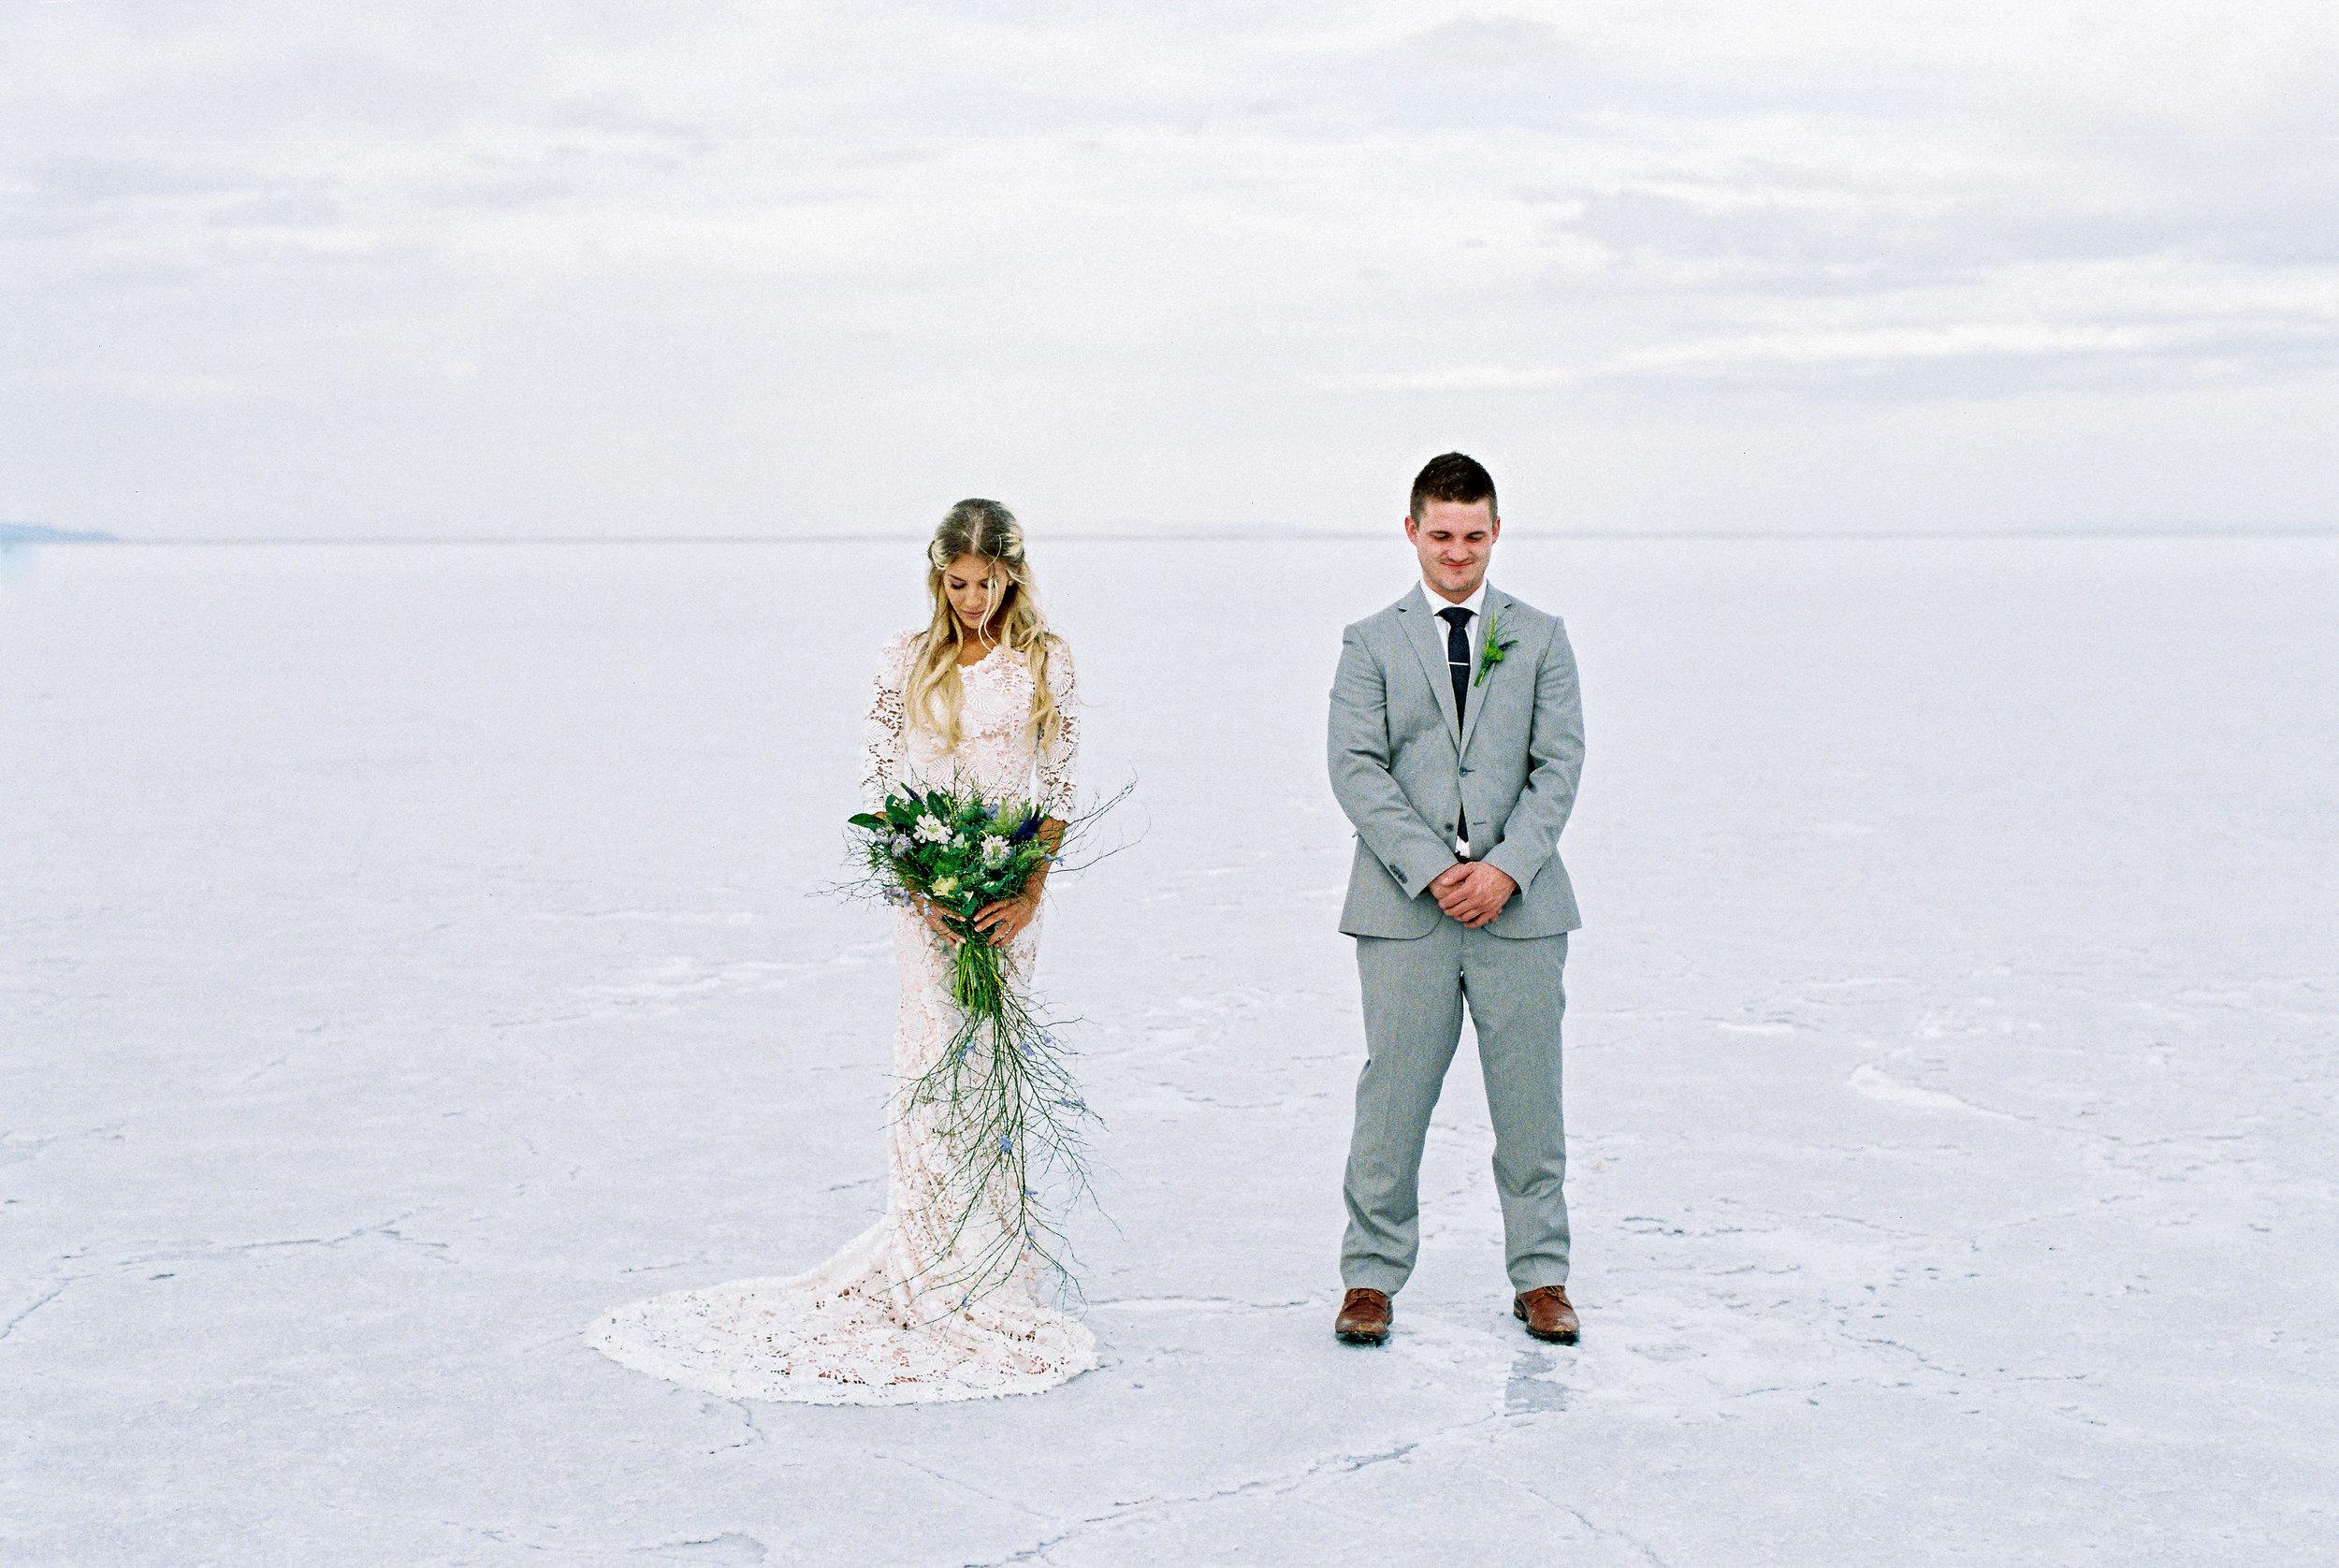 Film wedding photography Salt Flats Utah wedding locations